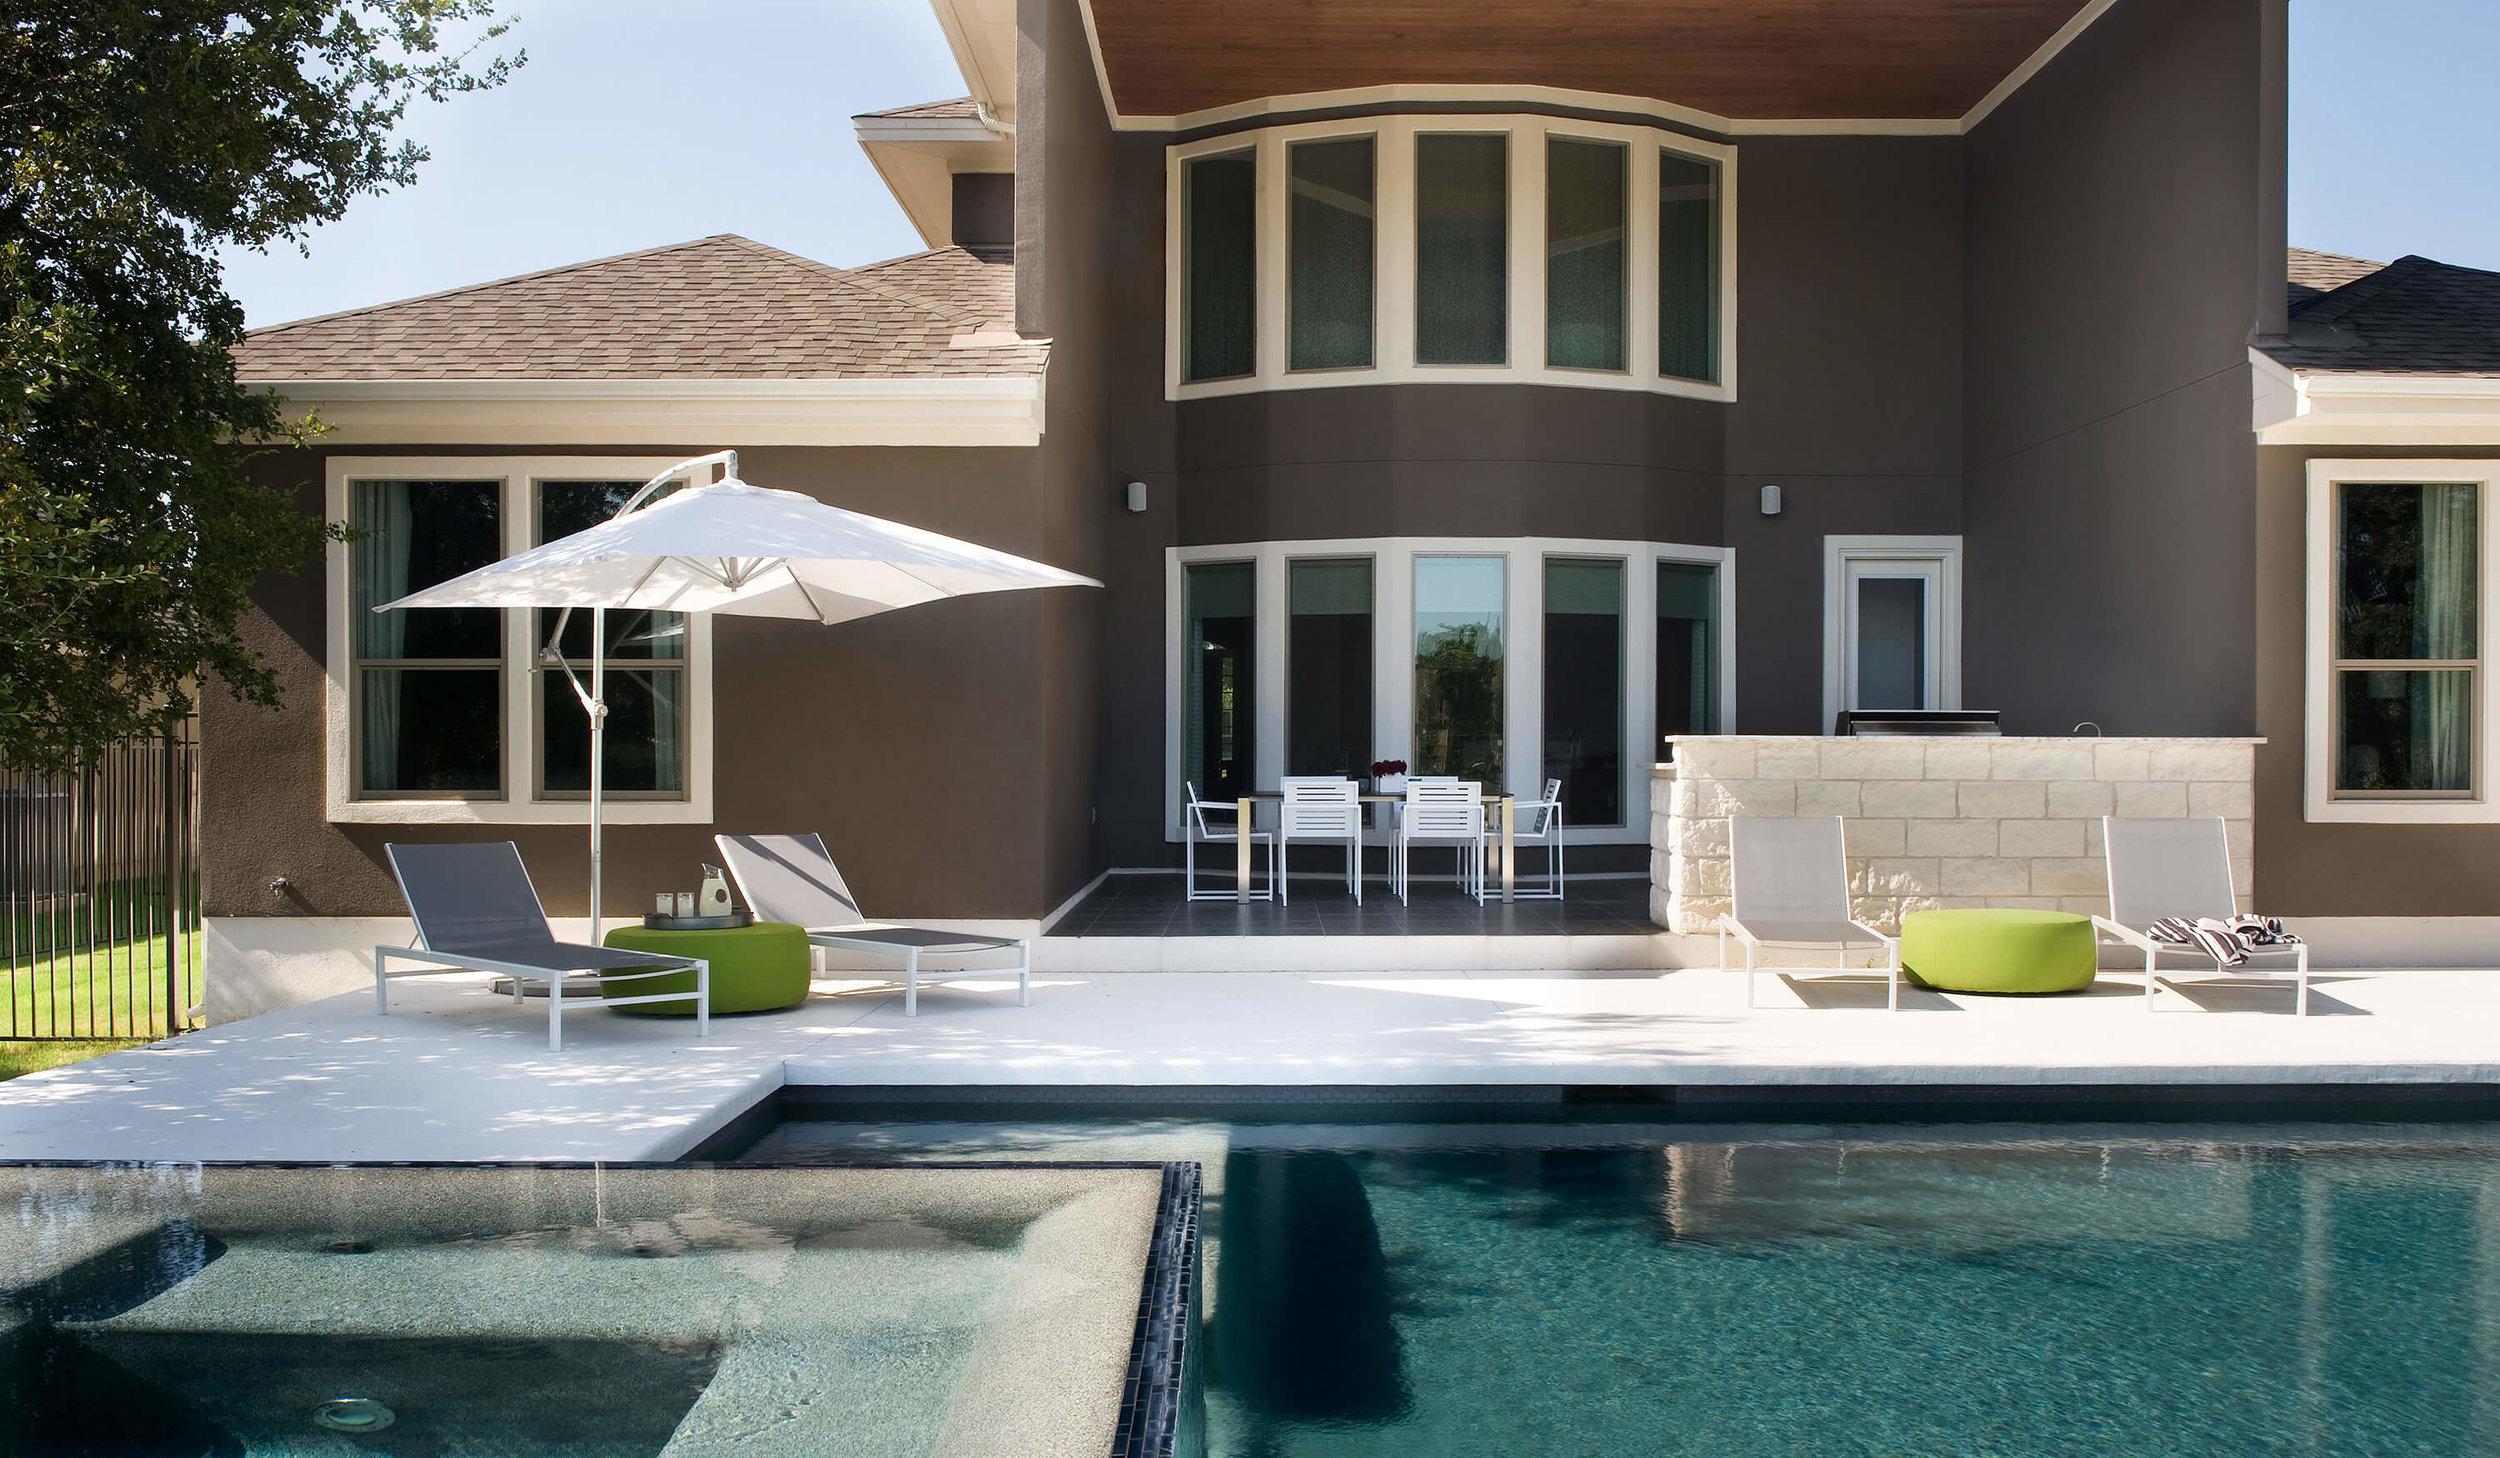 Brodie Springs Exterior Patio Pool | Robin Colton Interior Design Studio Austin Texas | www.robincolton.com